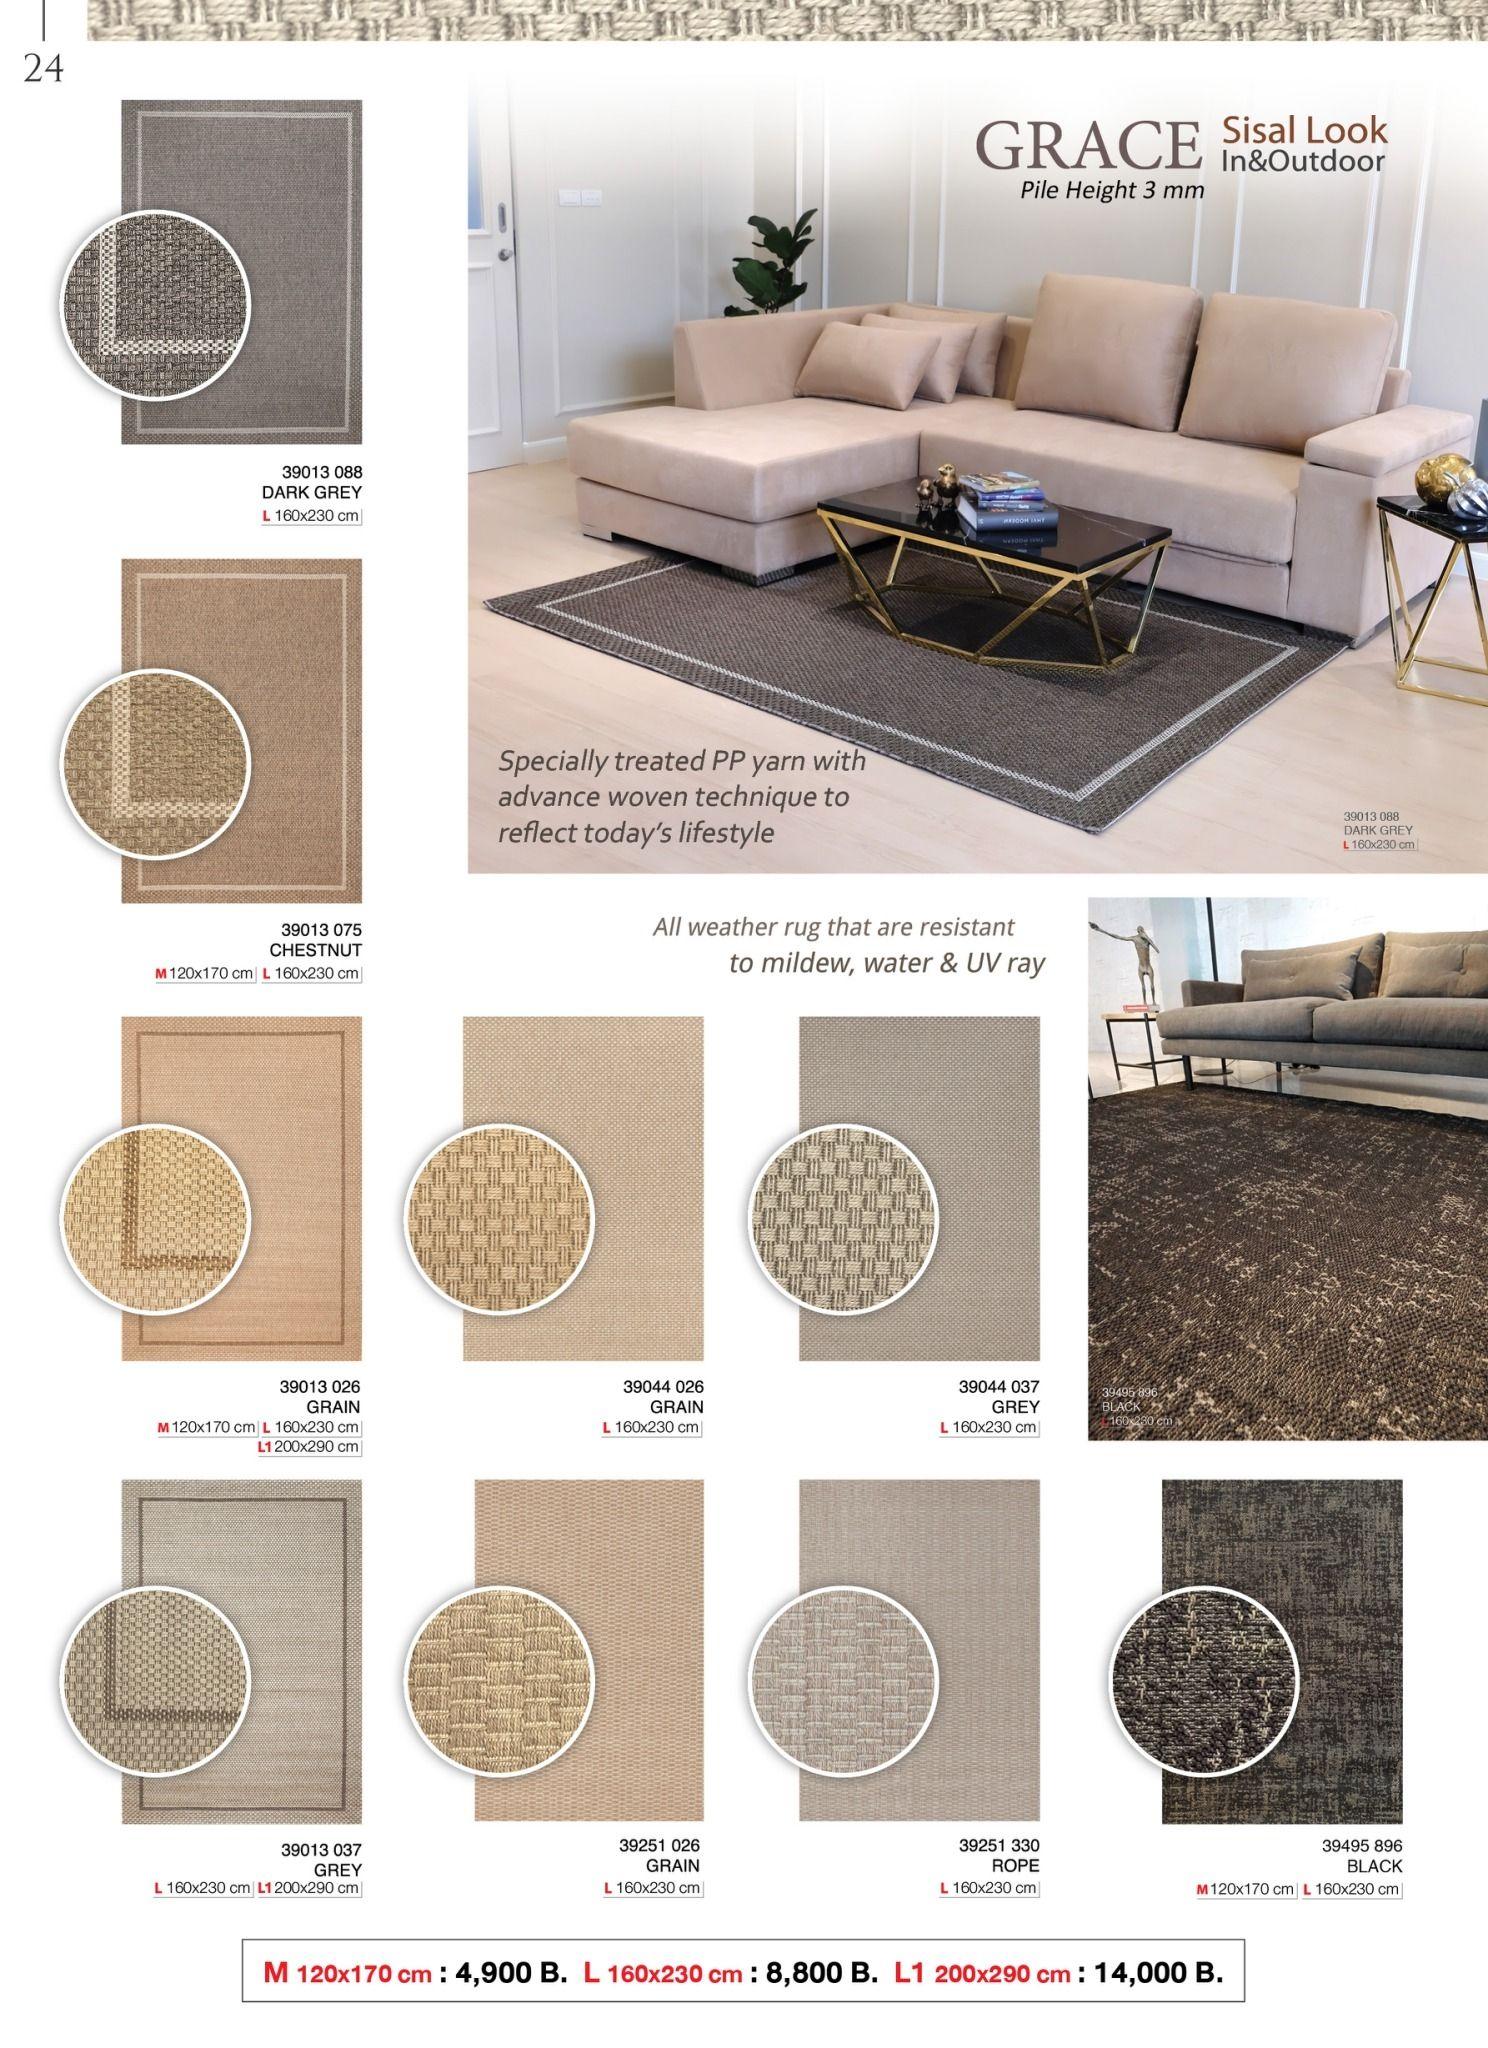 Grace Carpet & Outdoor Rug Sisal Look พรม พรมปูพื้น พรม